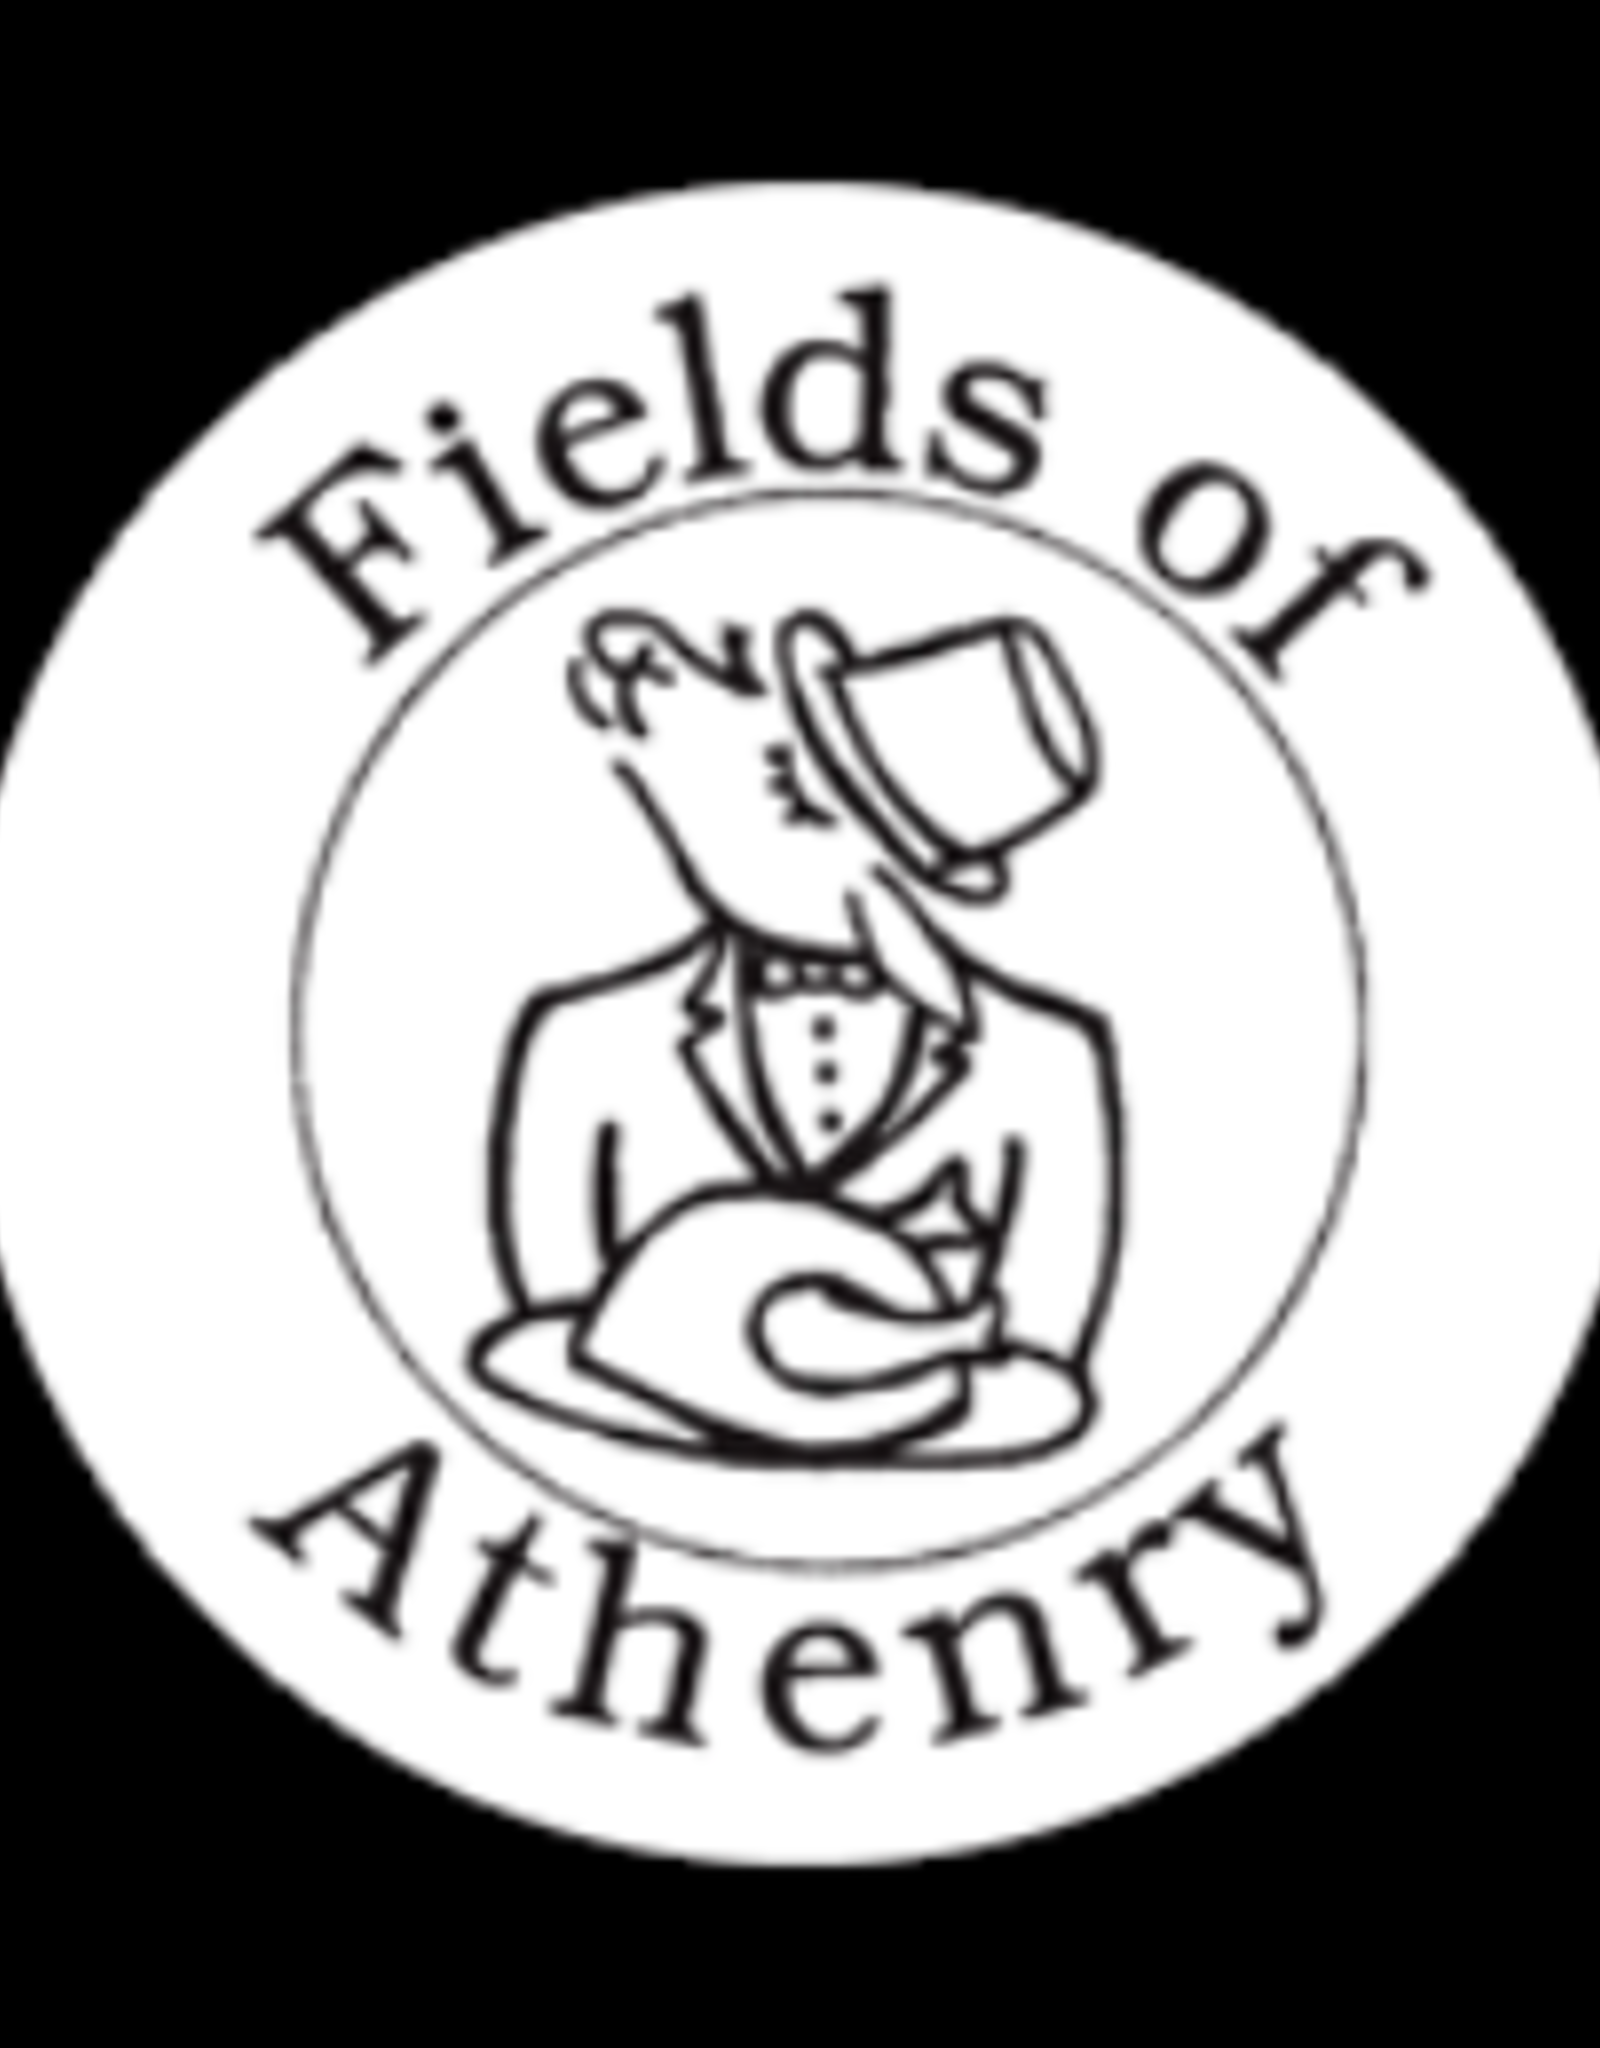 New Item Fields of Athenry Fresh Heritage Turkey 12lbs